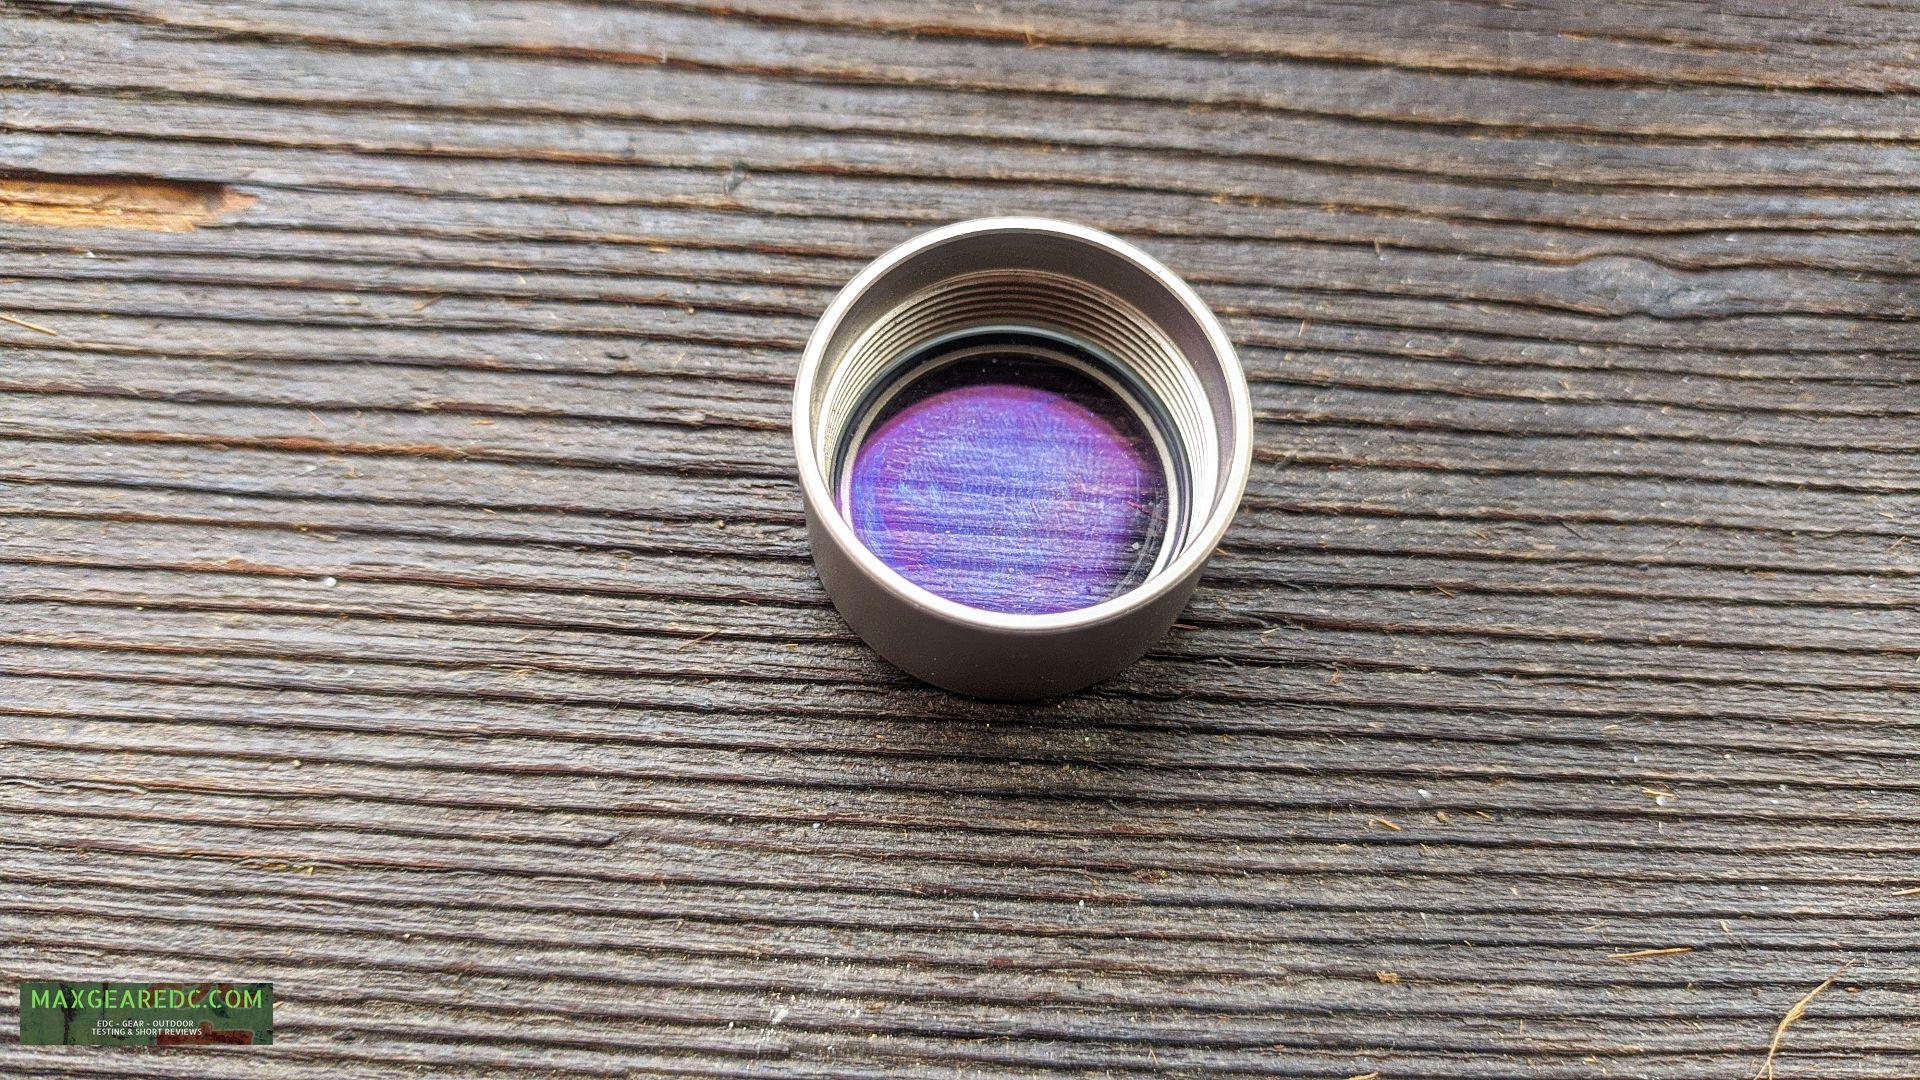 Lumintop_LM10_Flashlight_Review_Titanium_18650_maxgearedc.com_EDC_GEAR_OUTDOOR_TESTING_and_SHORT_REVIEWS_6